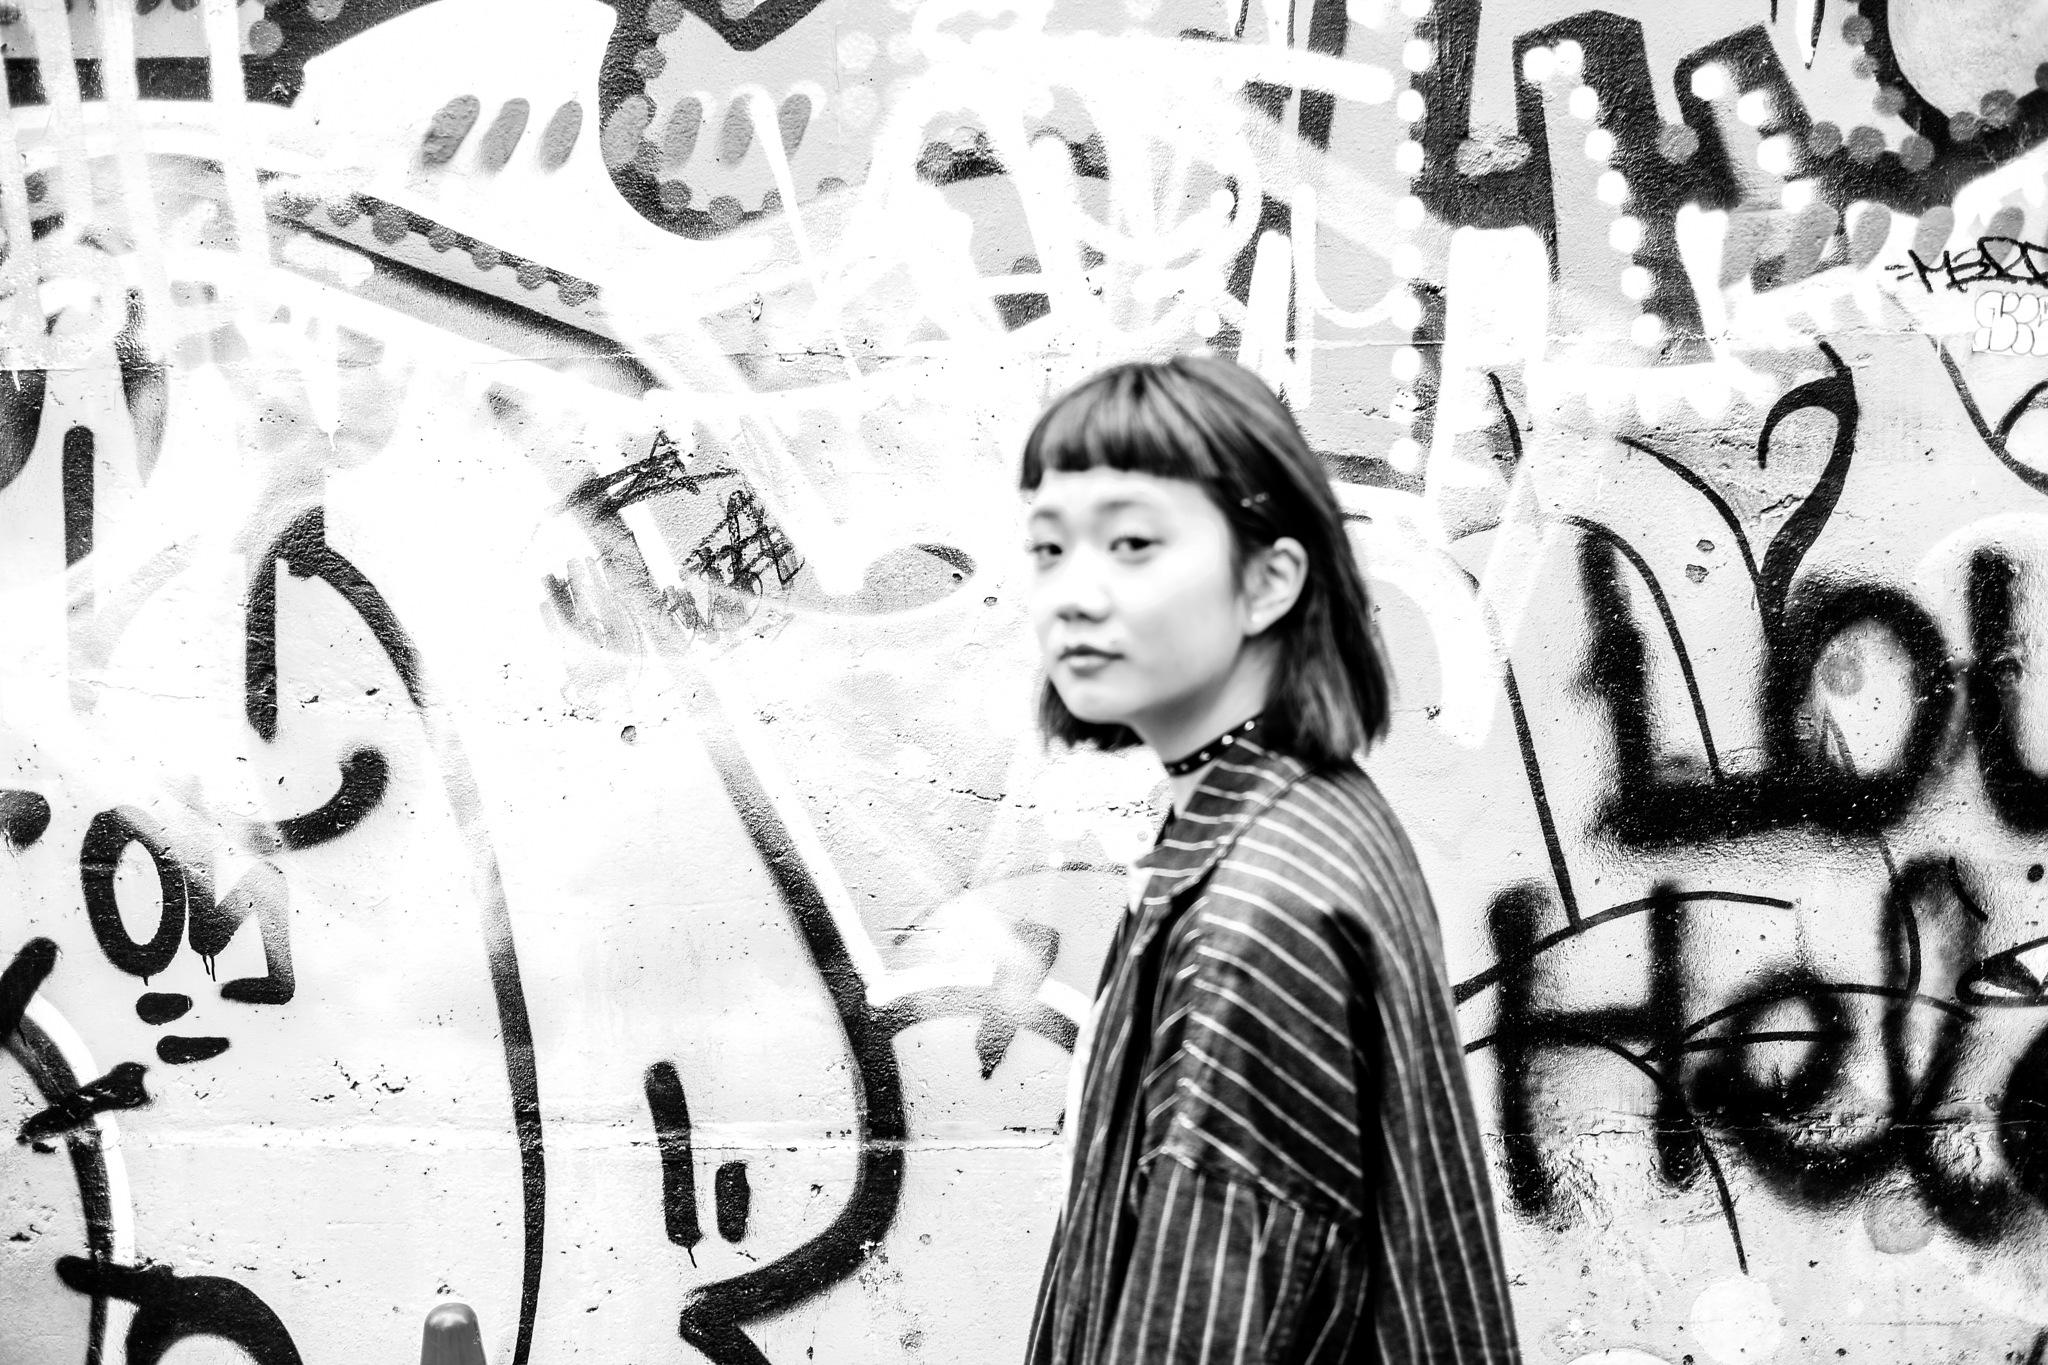 Wall Girl by Sai